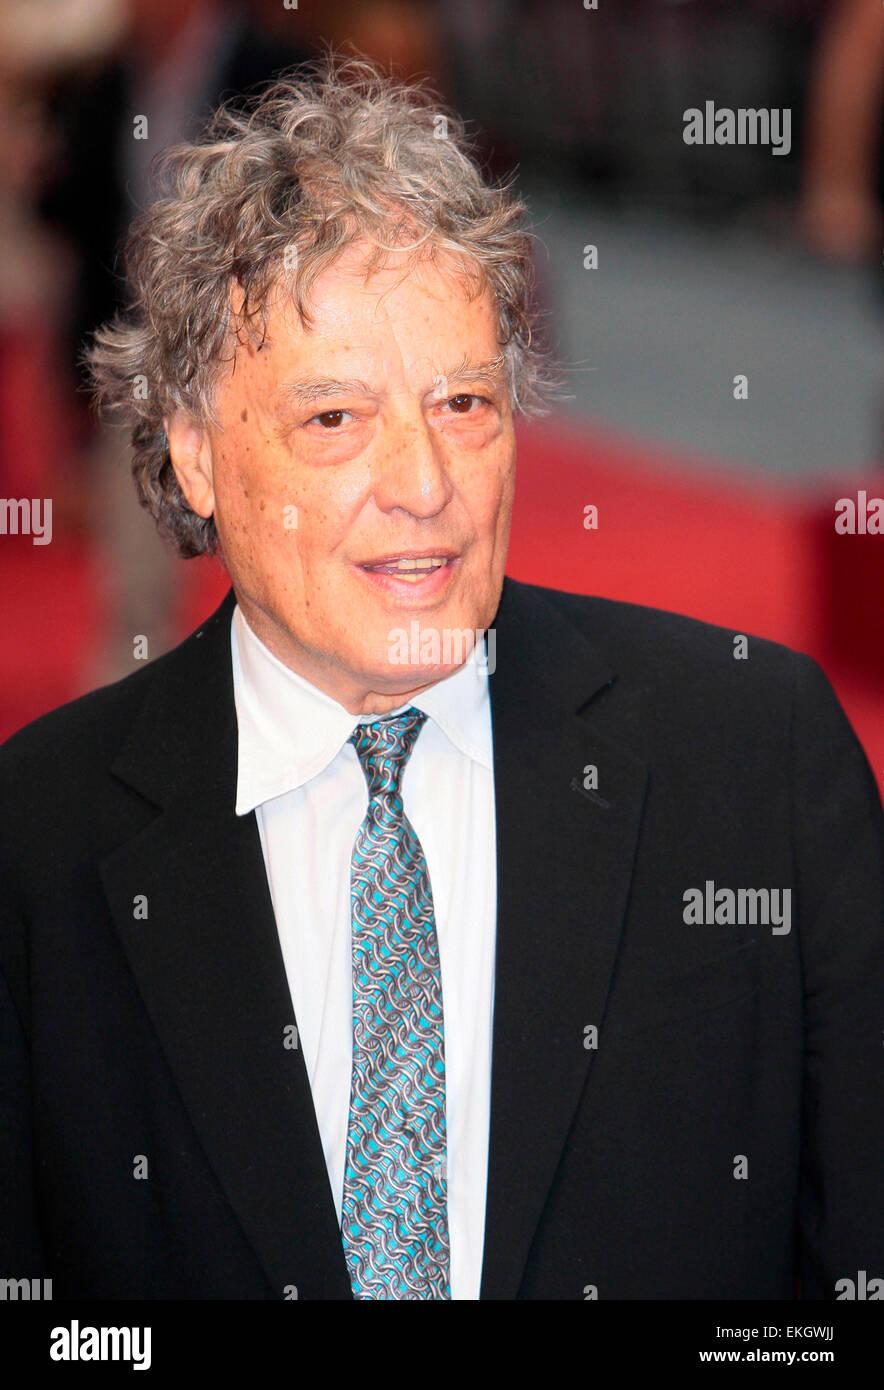 04.SEPTEMBER.2012. LONDON  TOM STOPPARD ATTENDS THE UK FILM PREMIERE OF NEW FILM ANNA KARENINA AT THE ODEON CINEMA, - Stock Image